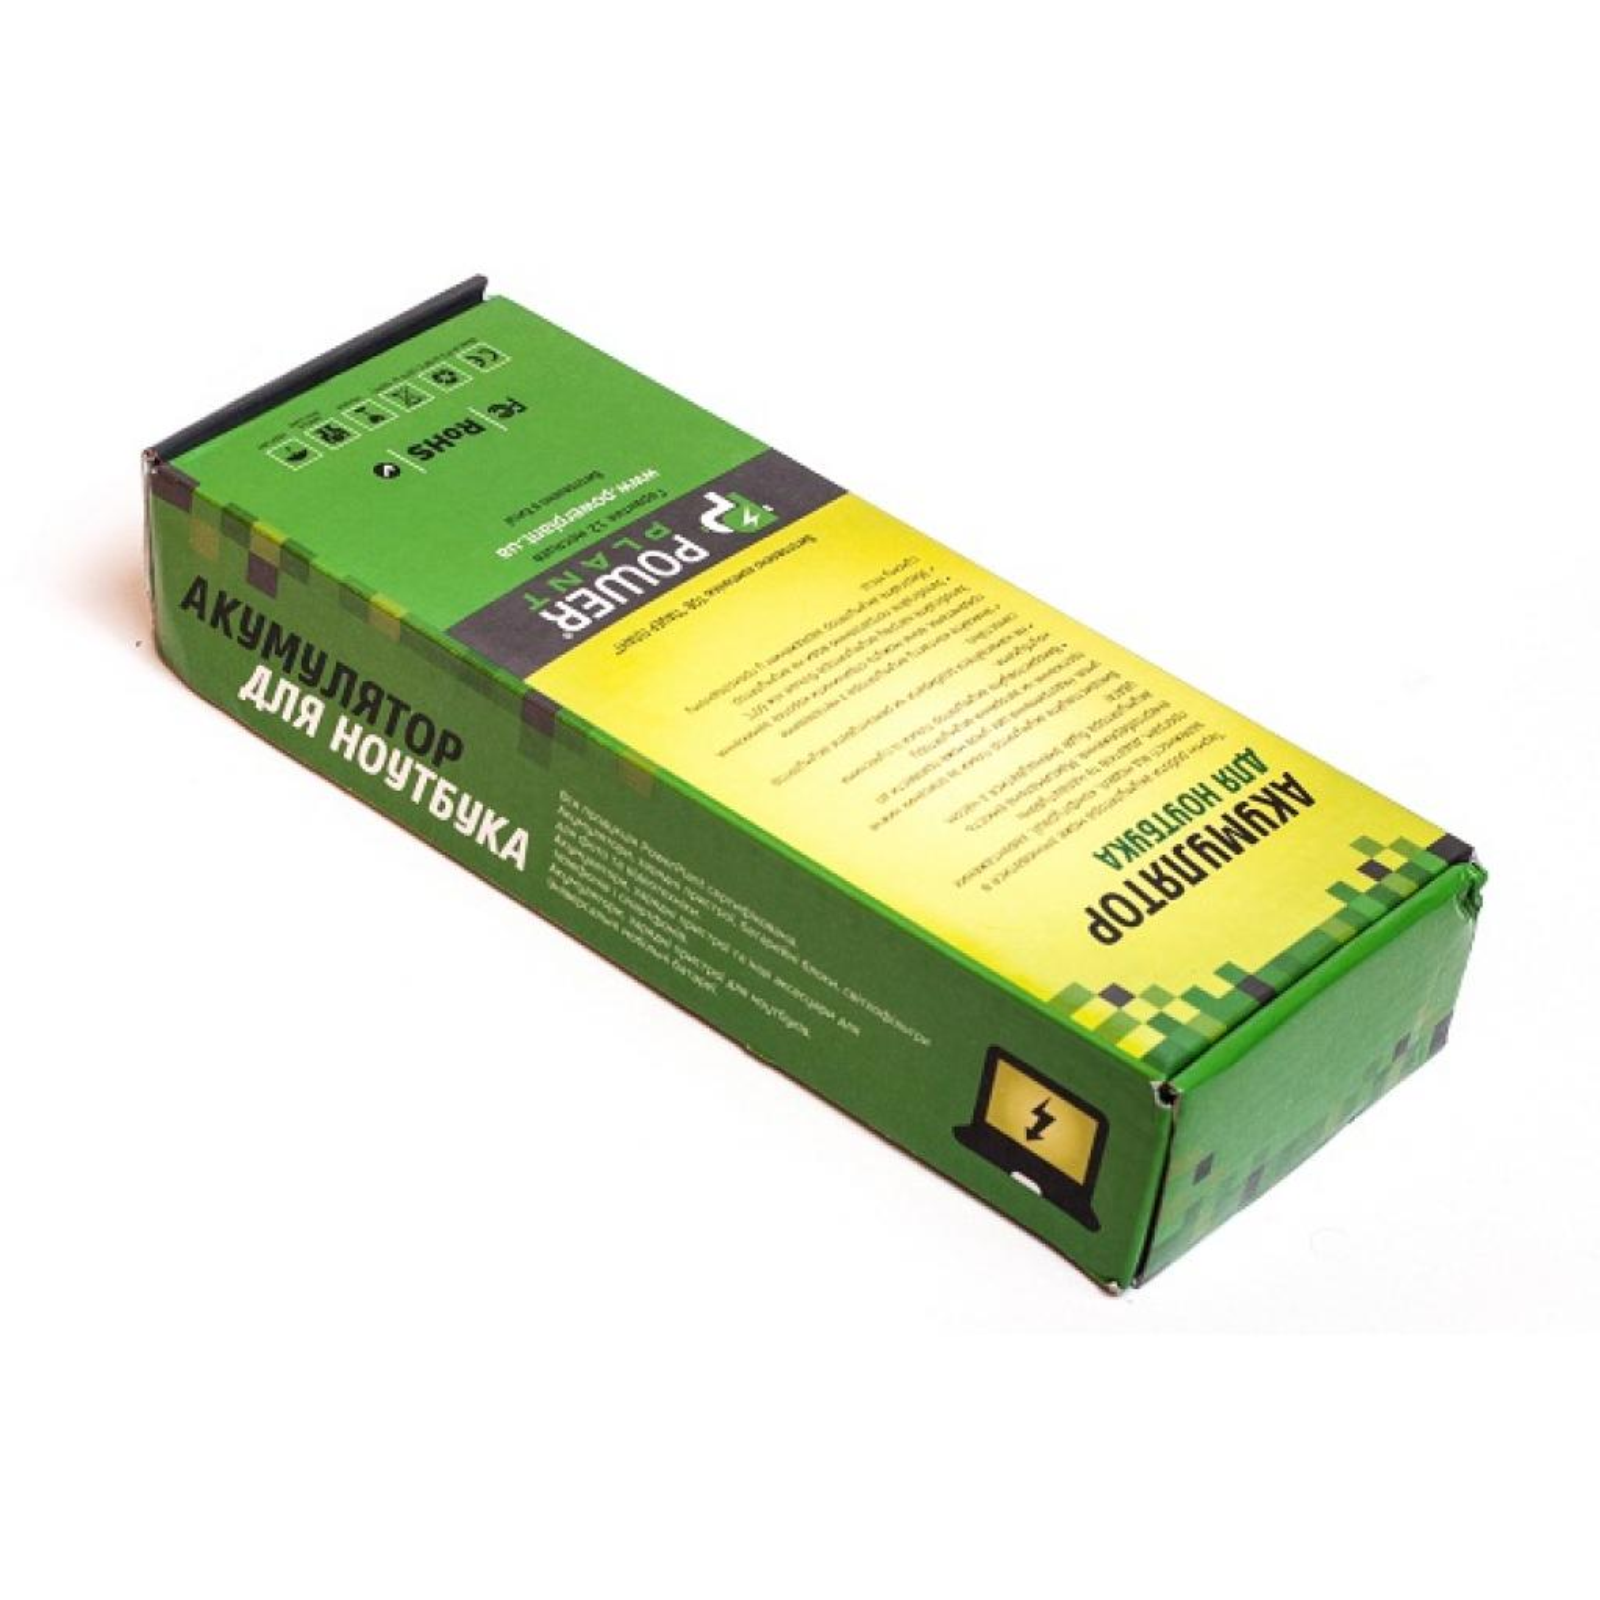 Аккумулятор для ноутбука ACER Aspire 5230 (AS07B41, AR5923LH) 11.1V 5200mAh PowerPlant (NB00000196) изображение 2